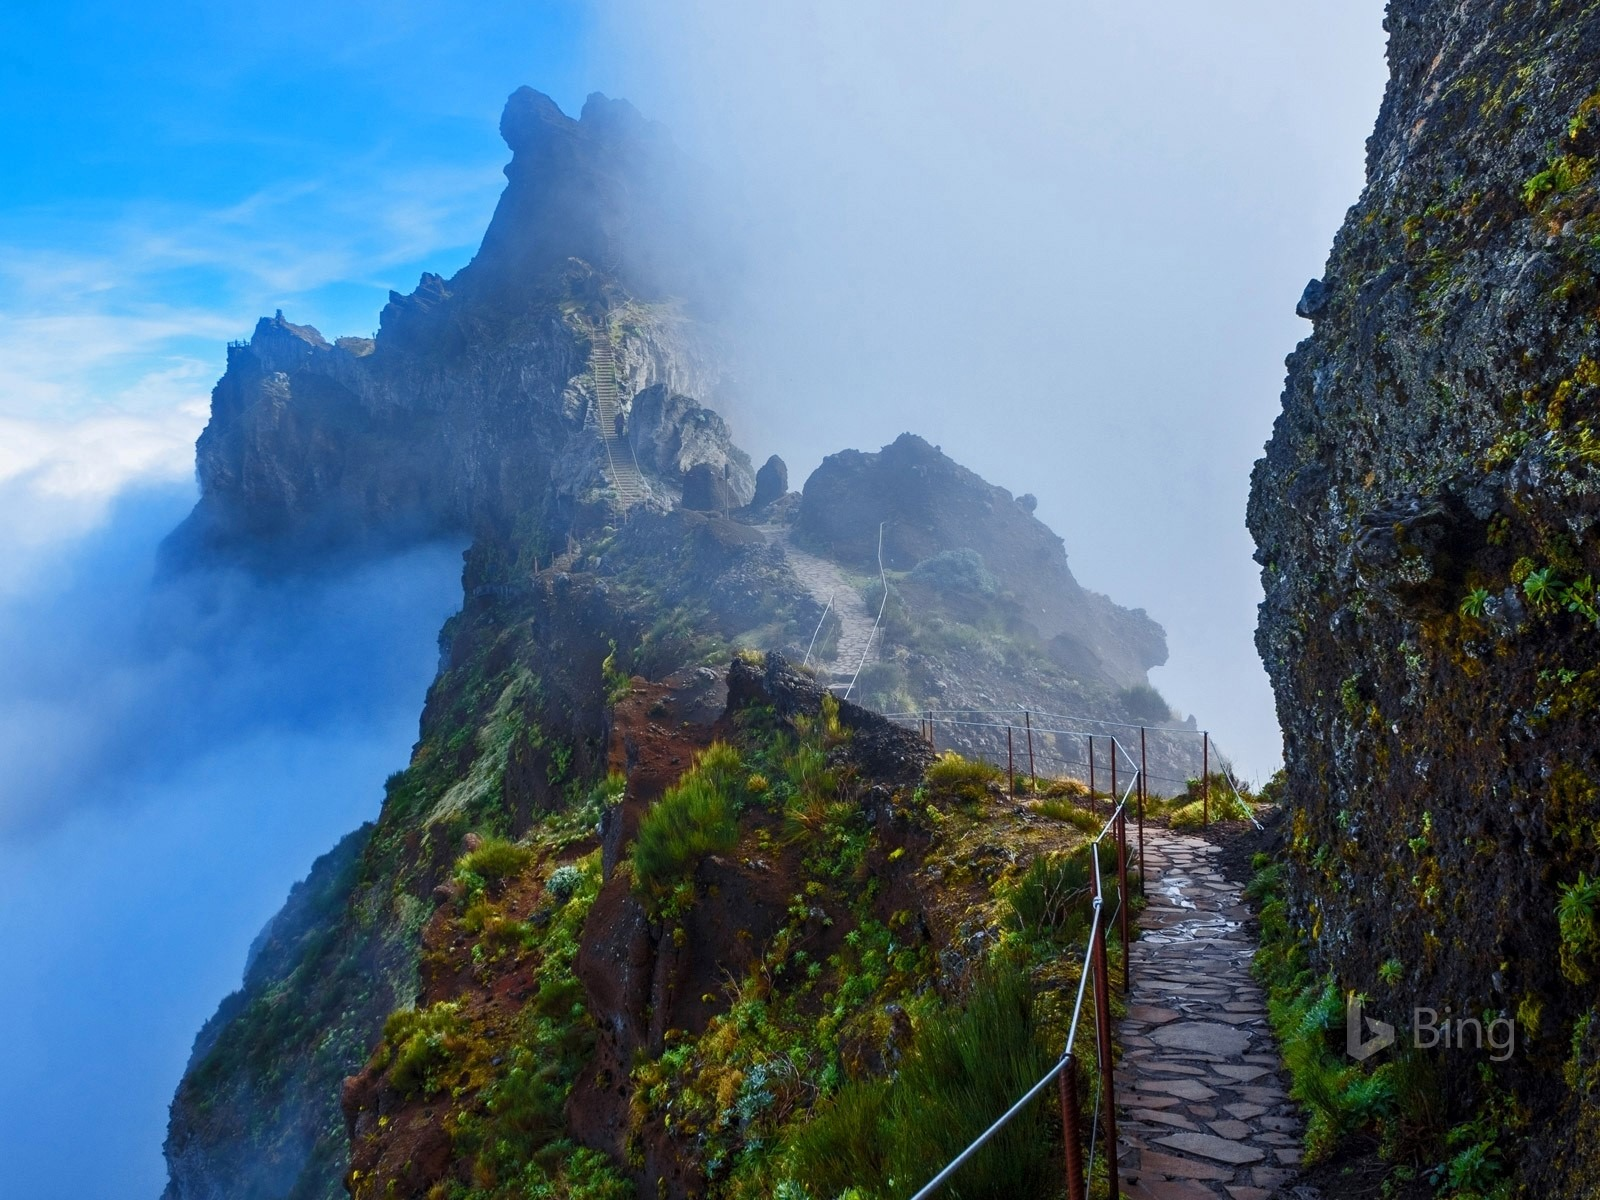 Portugal Mountain Trail In Madeira 2016 Bing Desktop